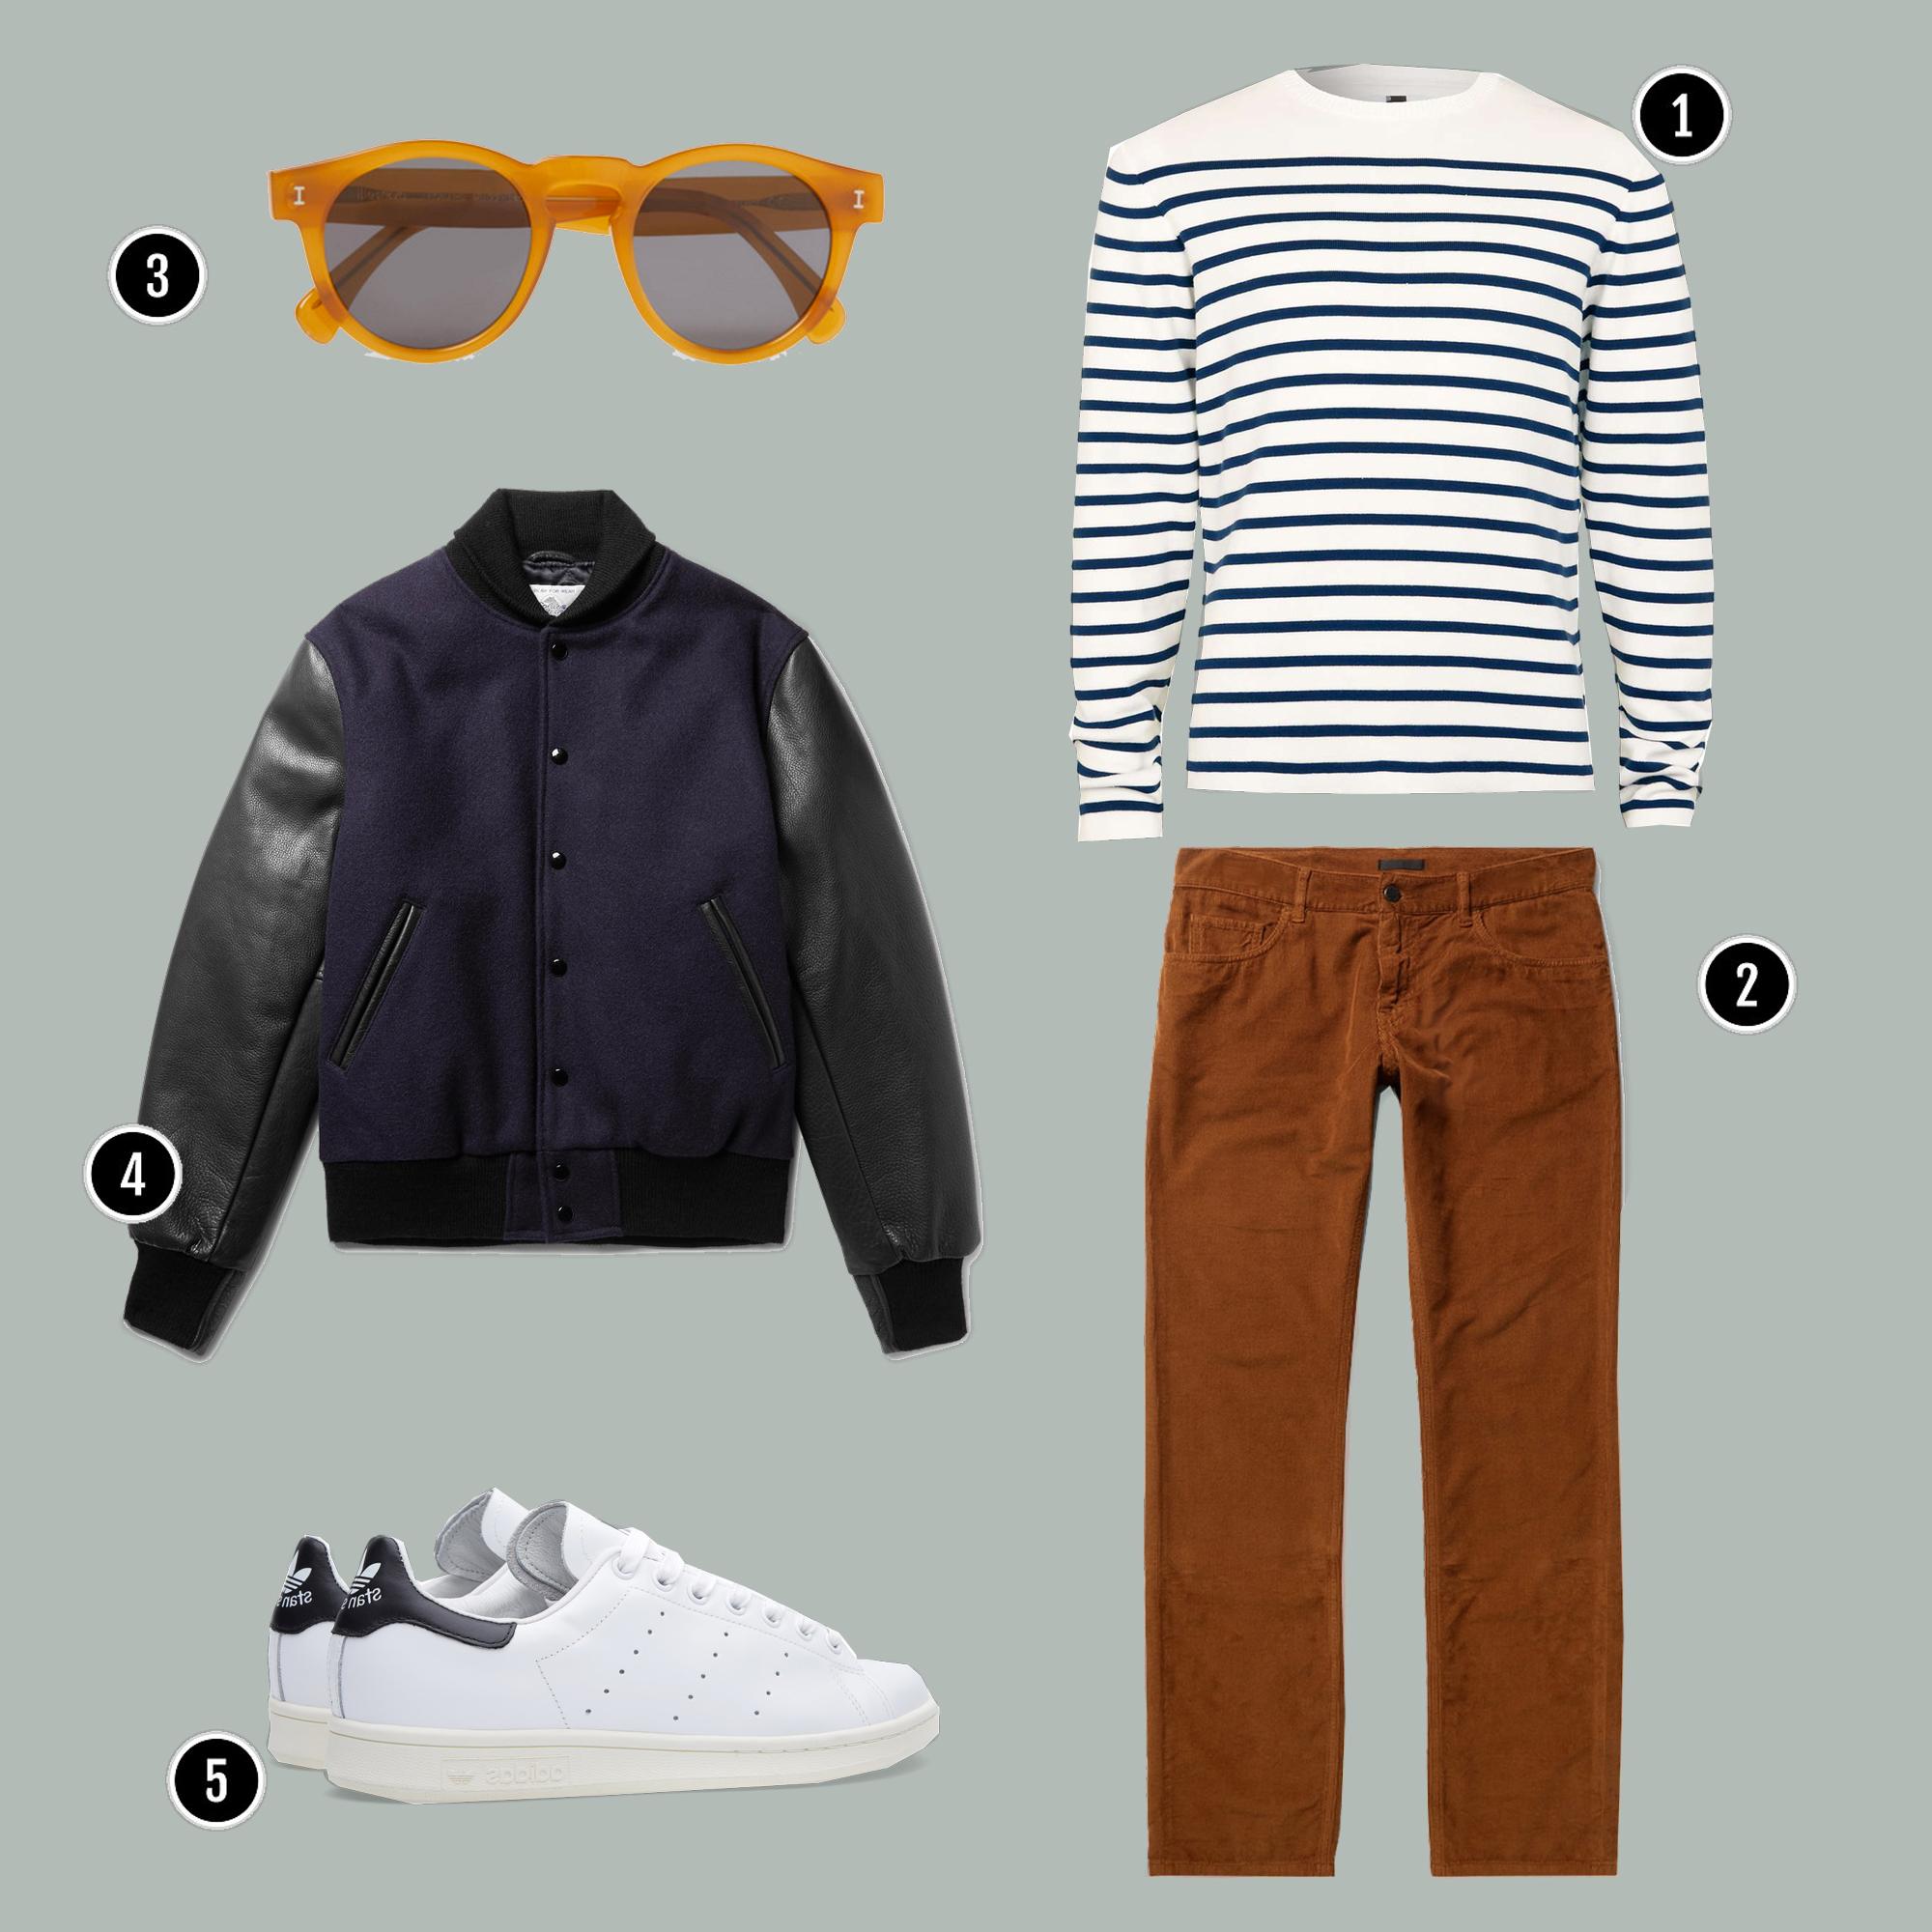 1. Áo: Topman/ 2. Quần: Gucci/ 3. Kính: ILLESTEVA / 4. Áo: Golden Bear / 5. Giày: Alexander Mcqueen